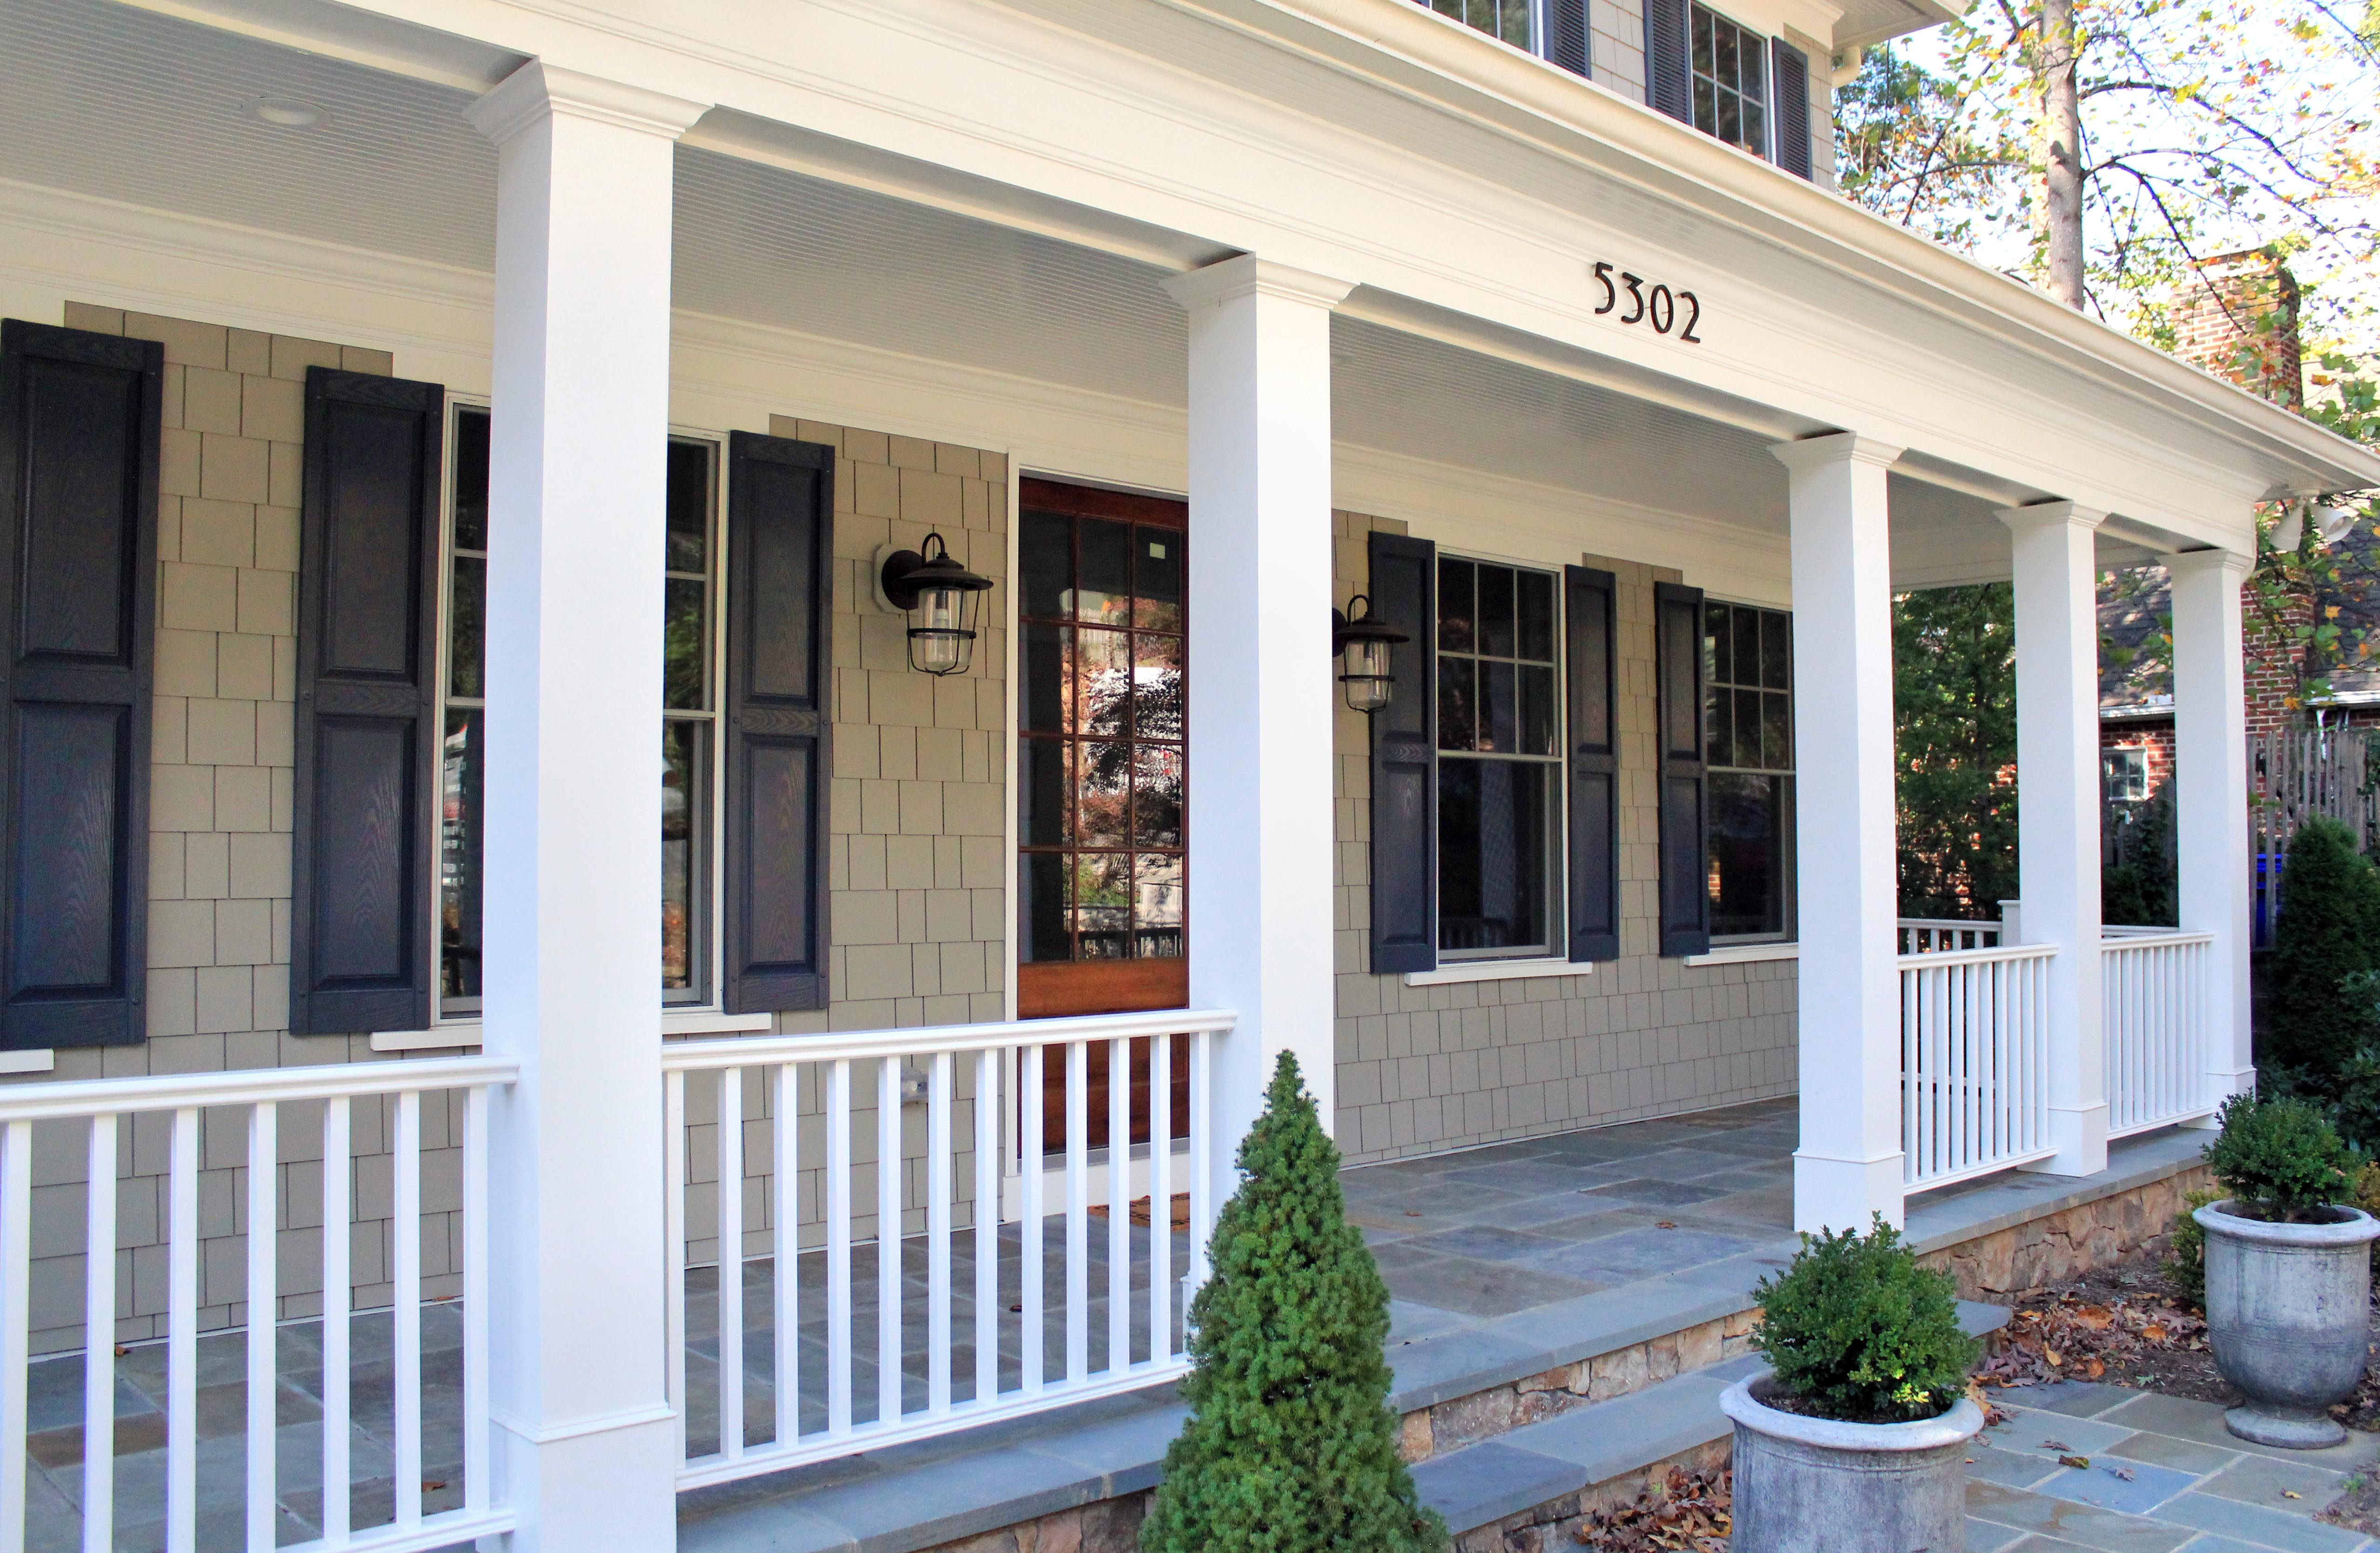 White Classic Style Porch Columns Create A Grand Look Porch Columns Patio Design Front Porch Addition